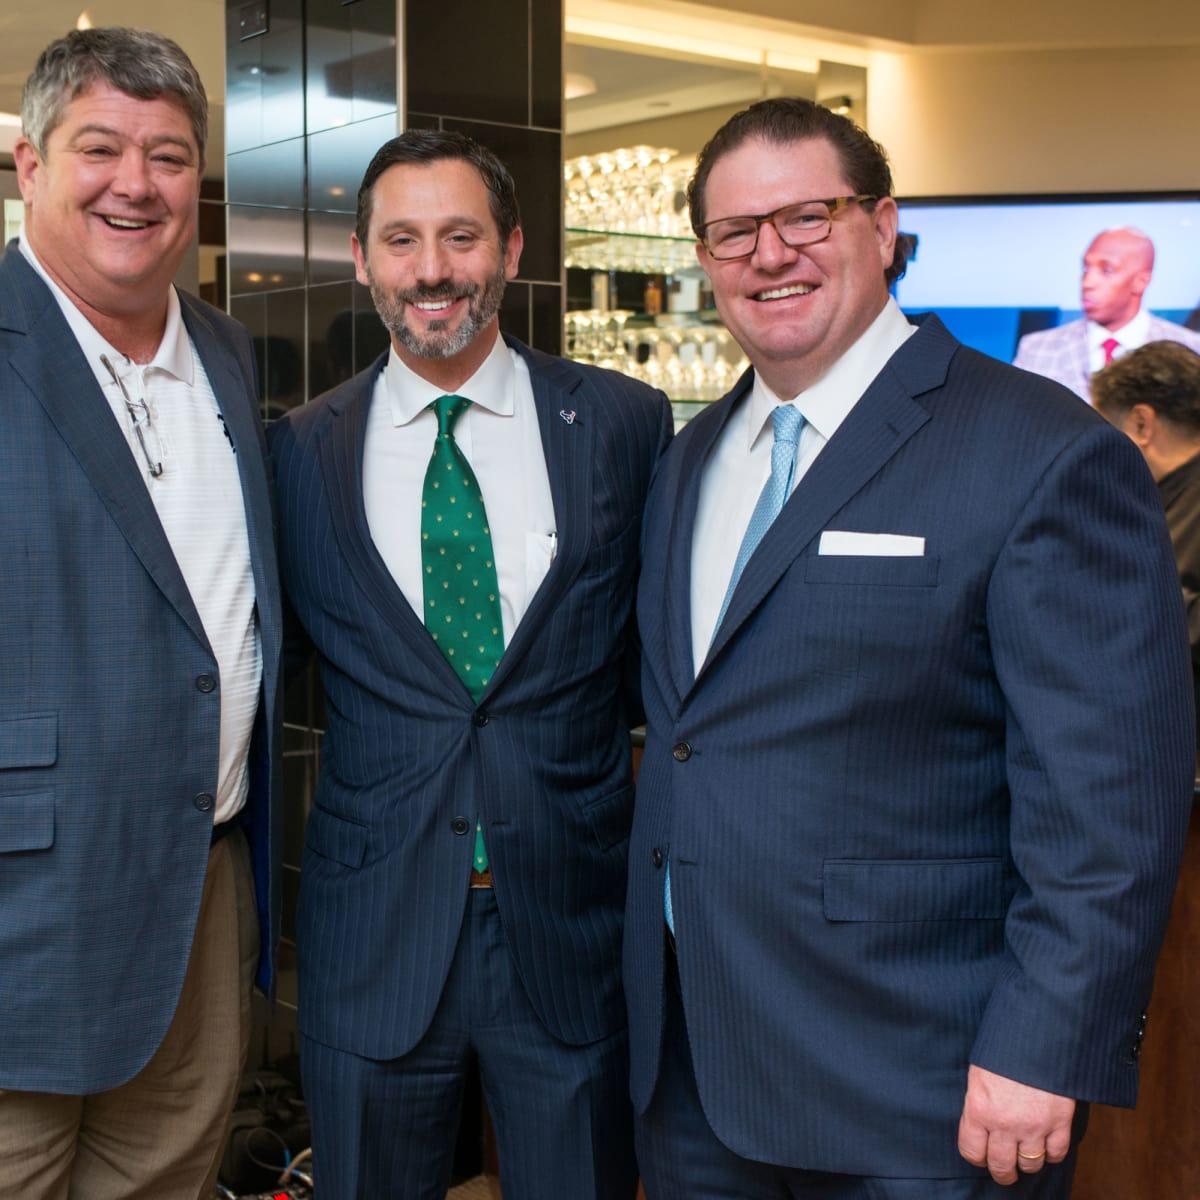 News, IW Marks Rolex Event, Dec. 2015, David Bailiff, Brad Marks, Paul Doyle